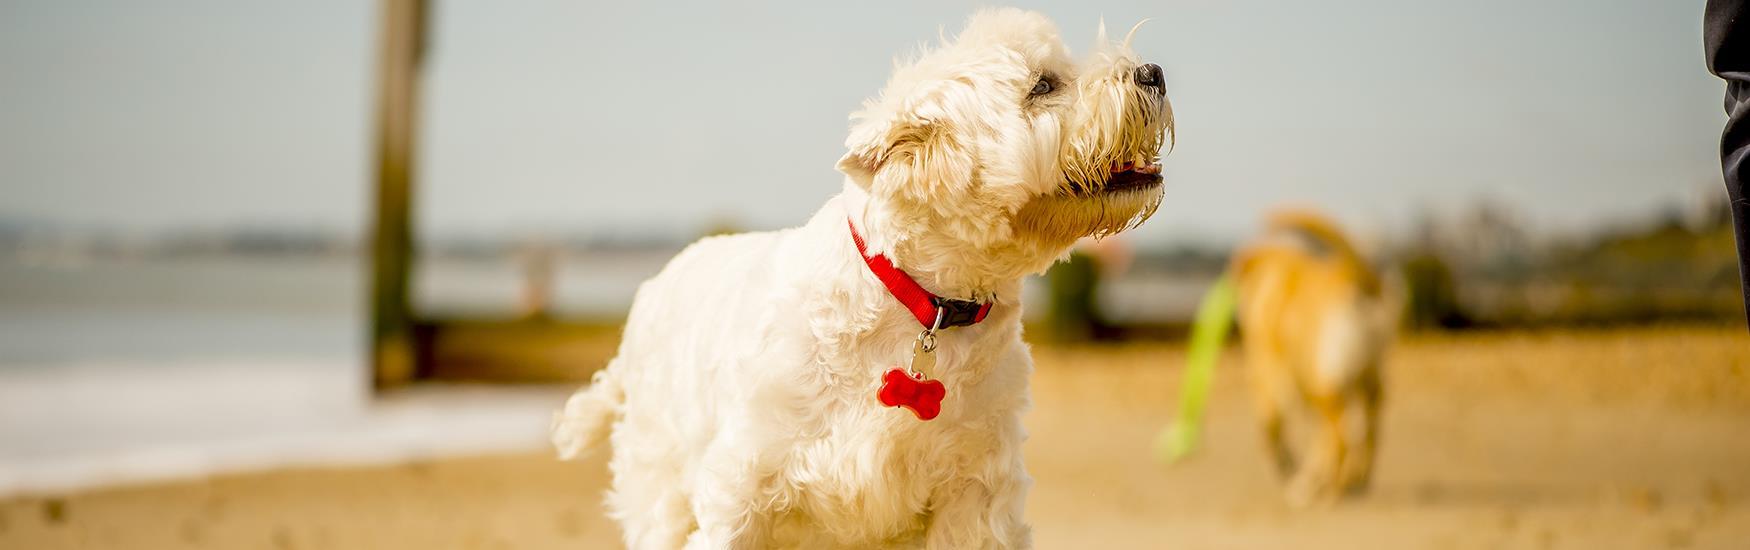 White Scotty dog running along the golden sands on Bournemouth Beach